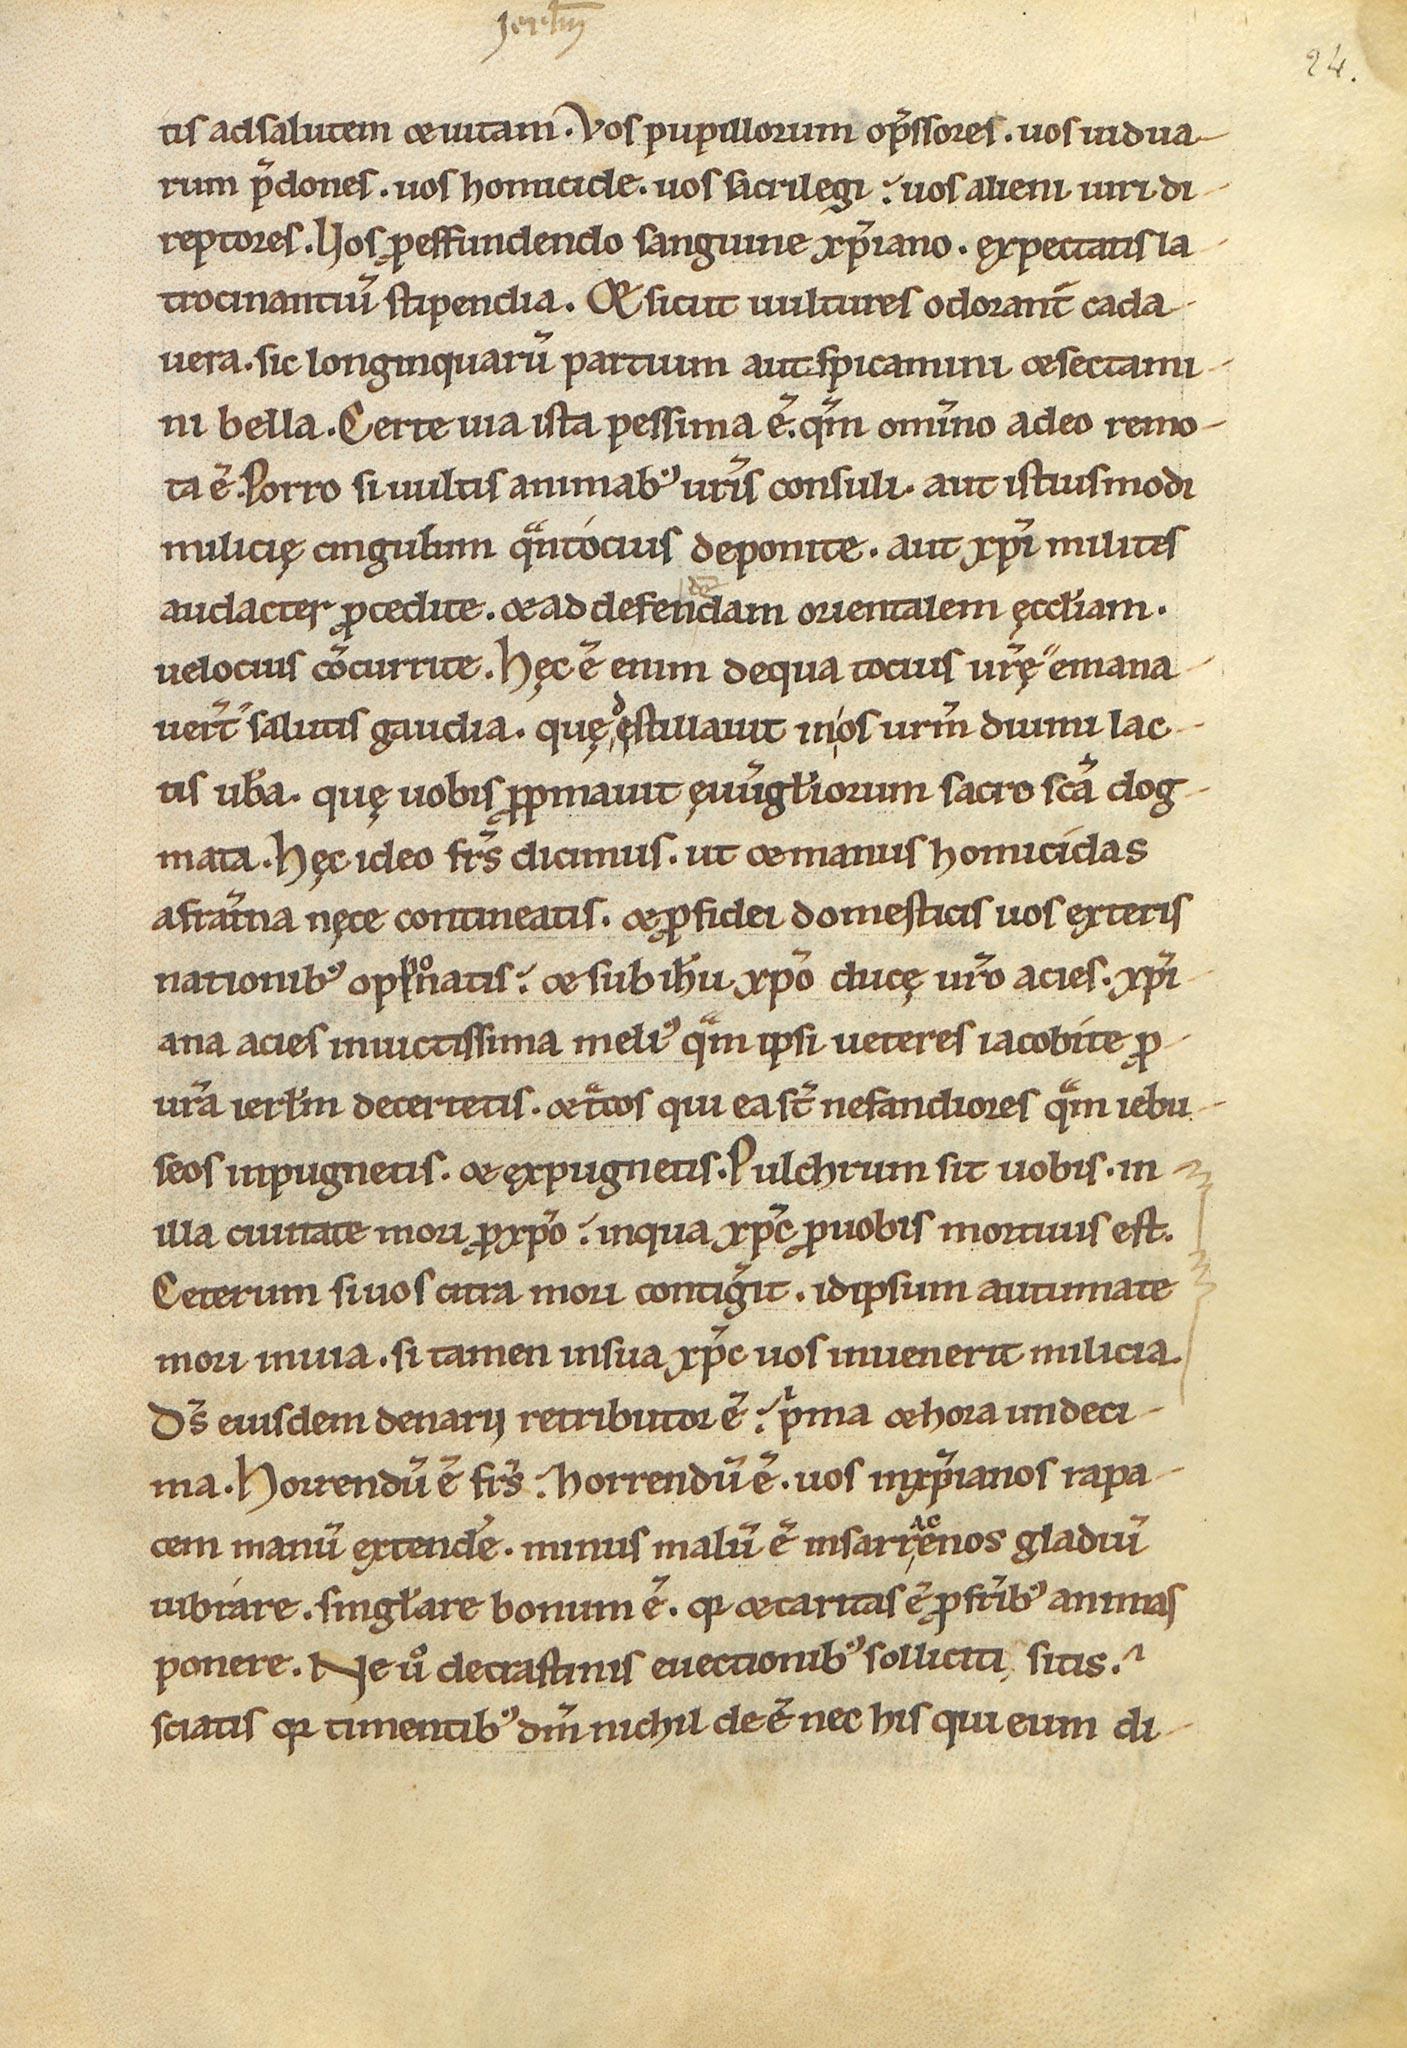 Manuscrit-Historia-Hierosolimitana-24r°